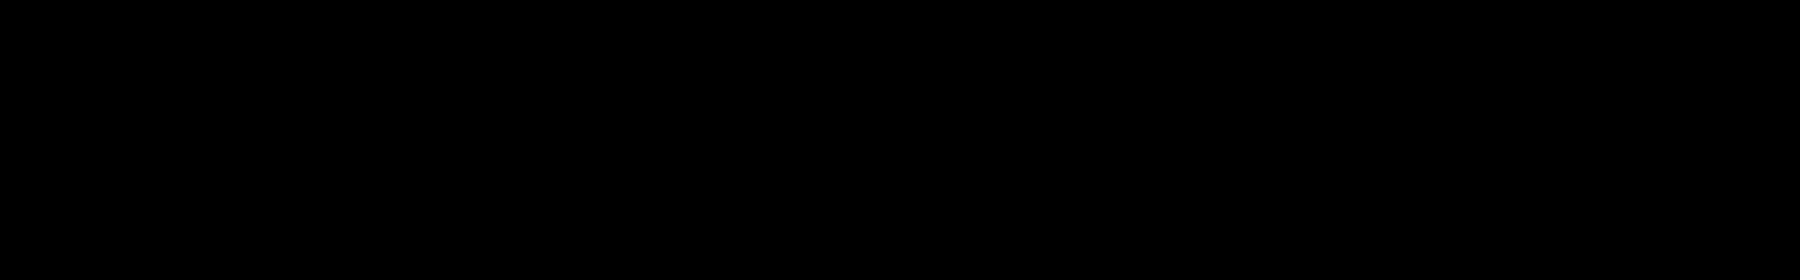 Serum Electro Control audio waveform